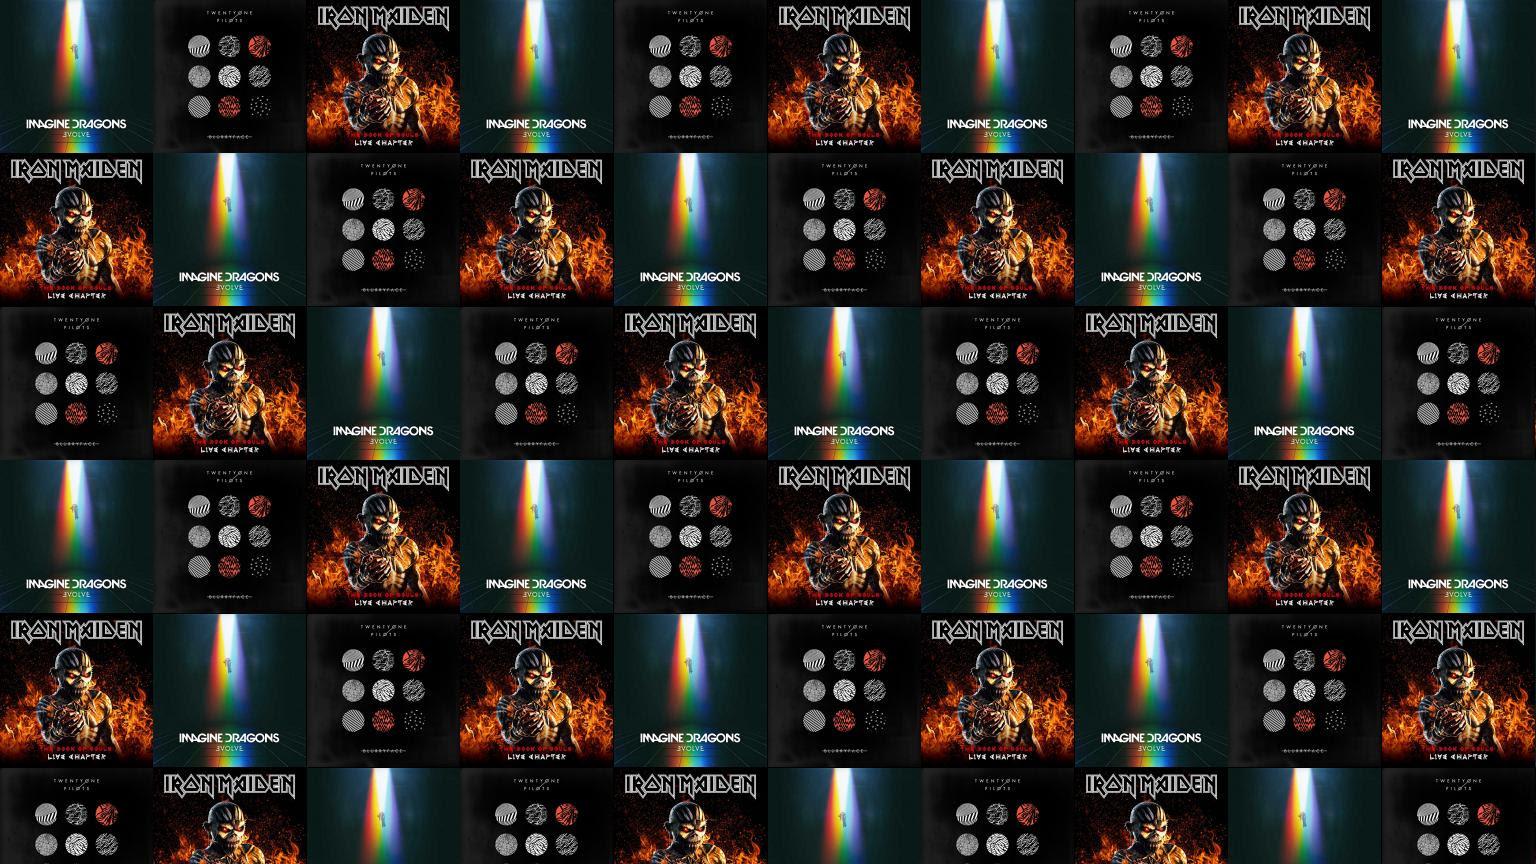 Imagine Dragons Evolve Twenty One Pilots Blurry Face Wallpaper